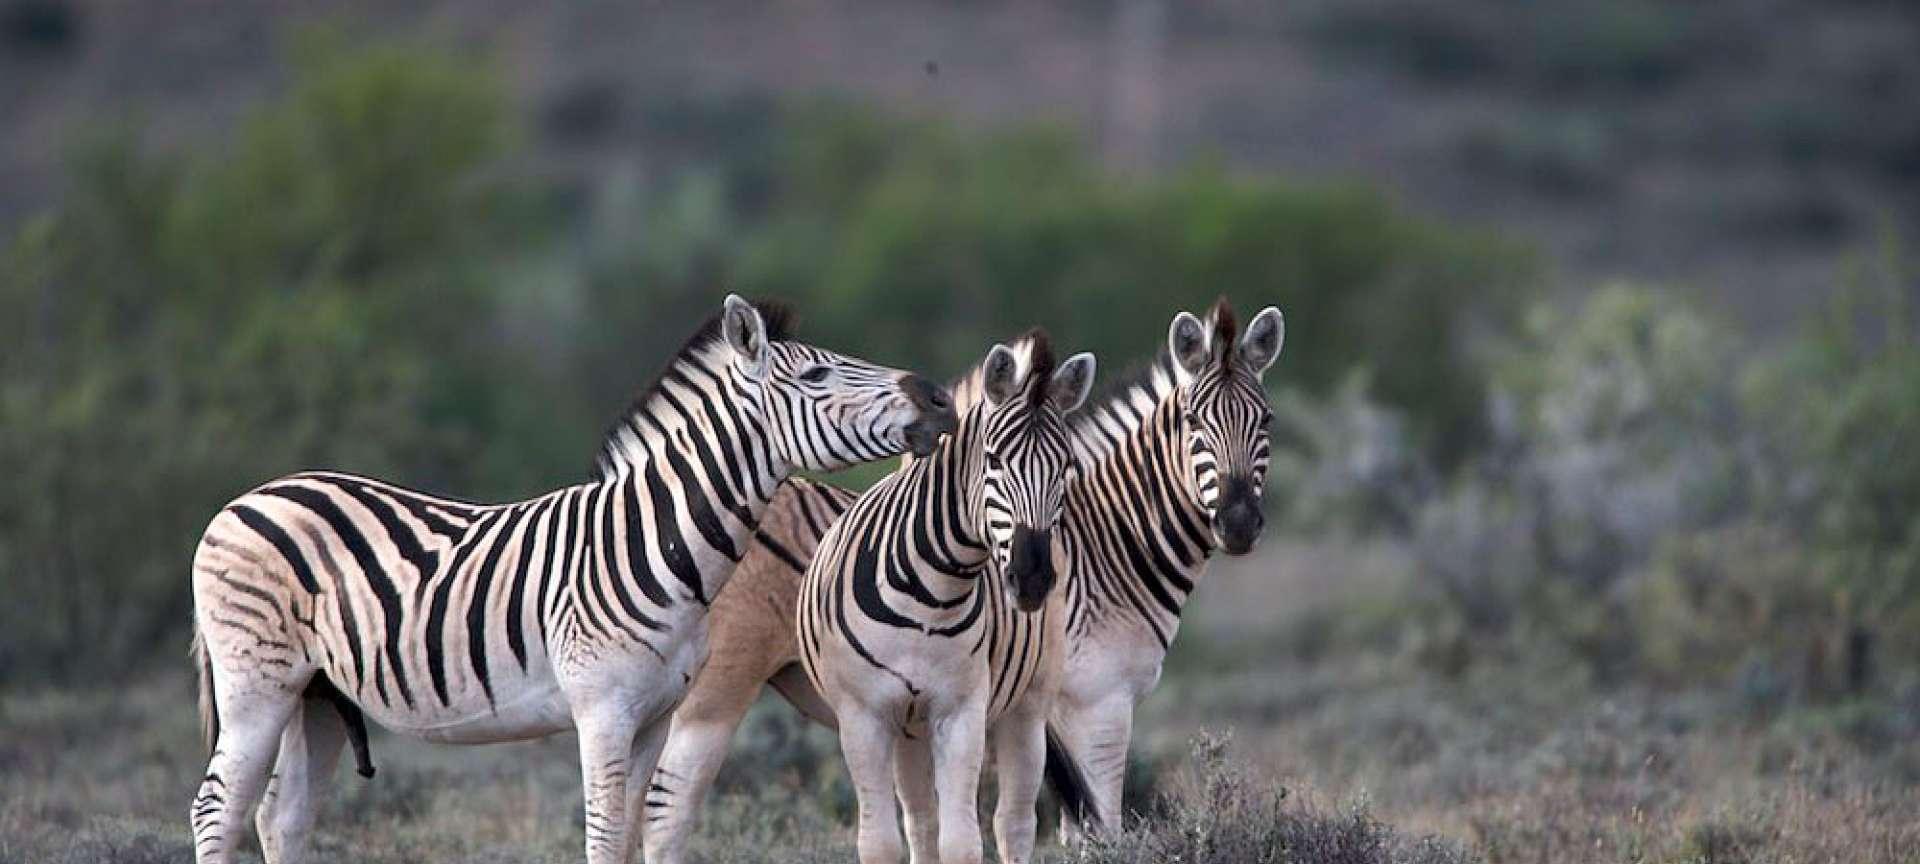 Karoo - Africa Wildlife Safaris